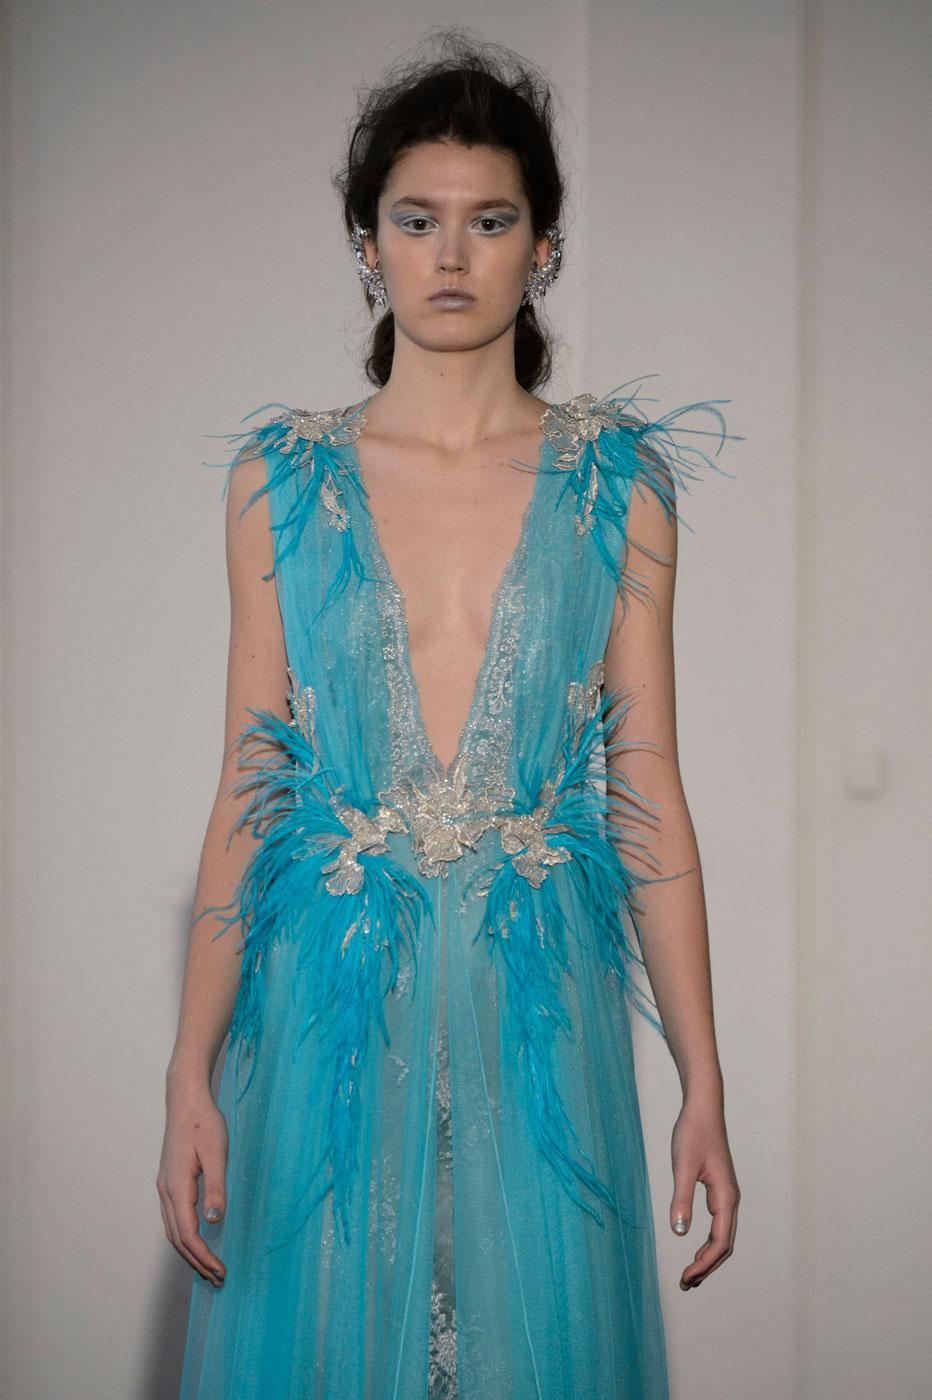 Busardi-fashion-runway-show-haute-couture-paris-spring-2015-the-impression-53